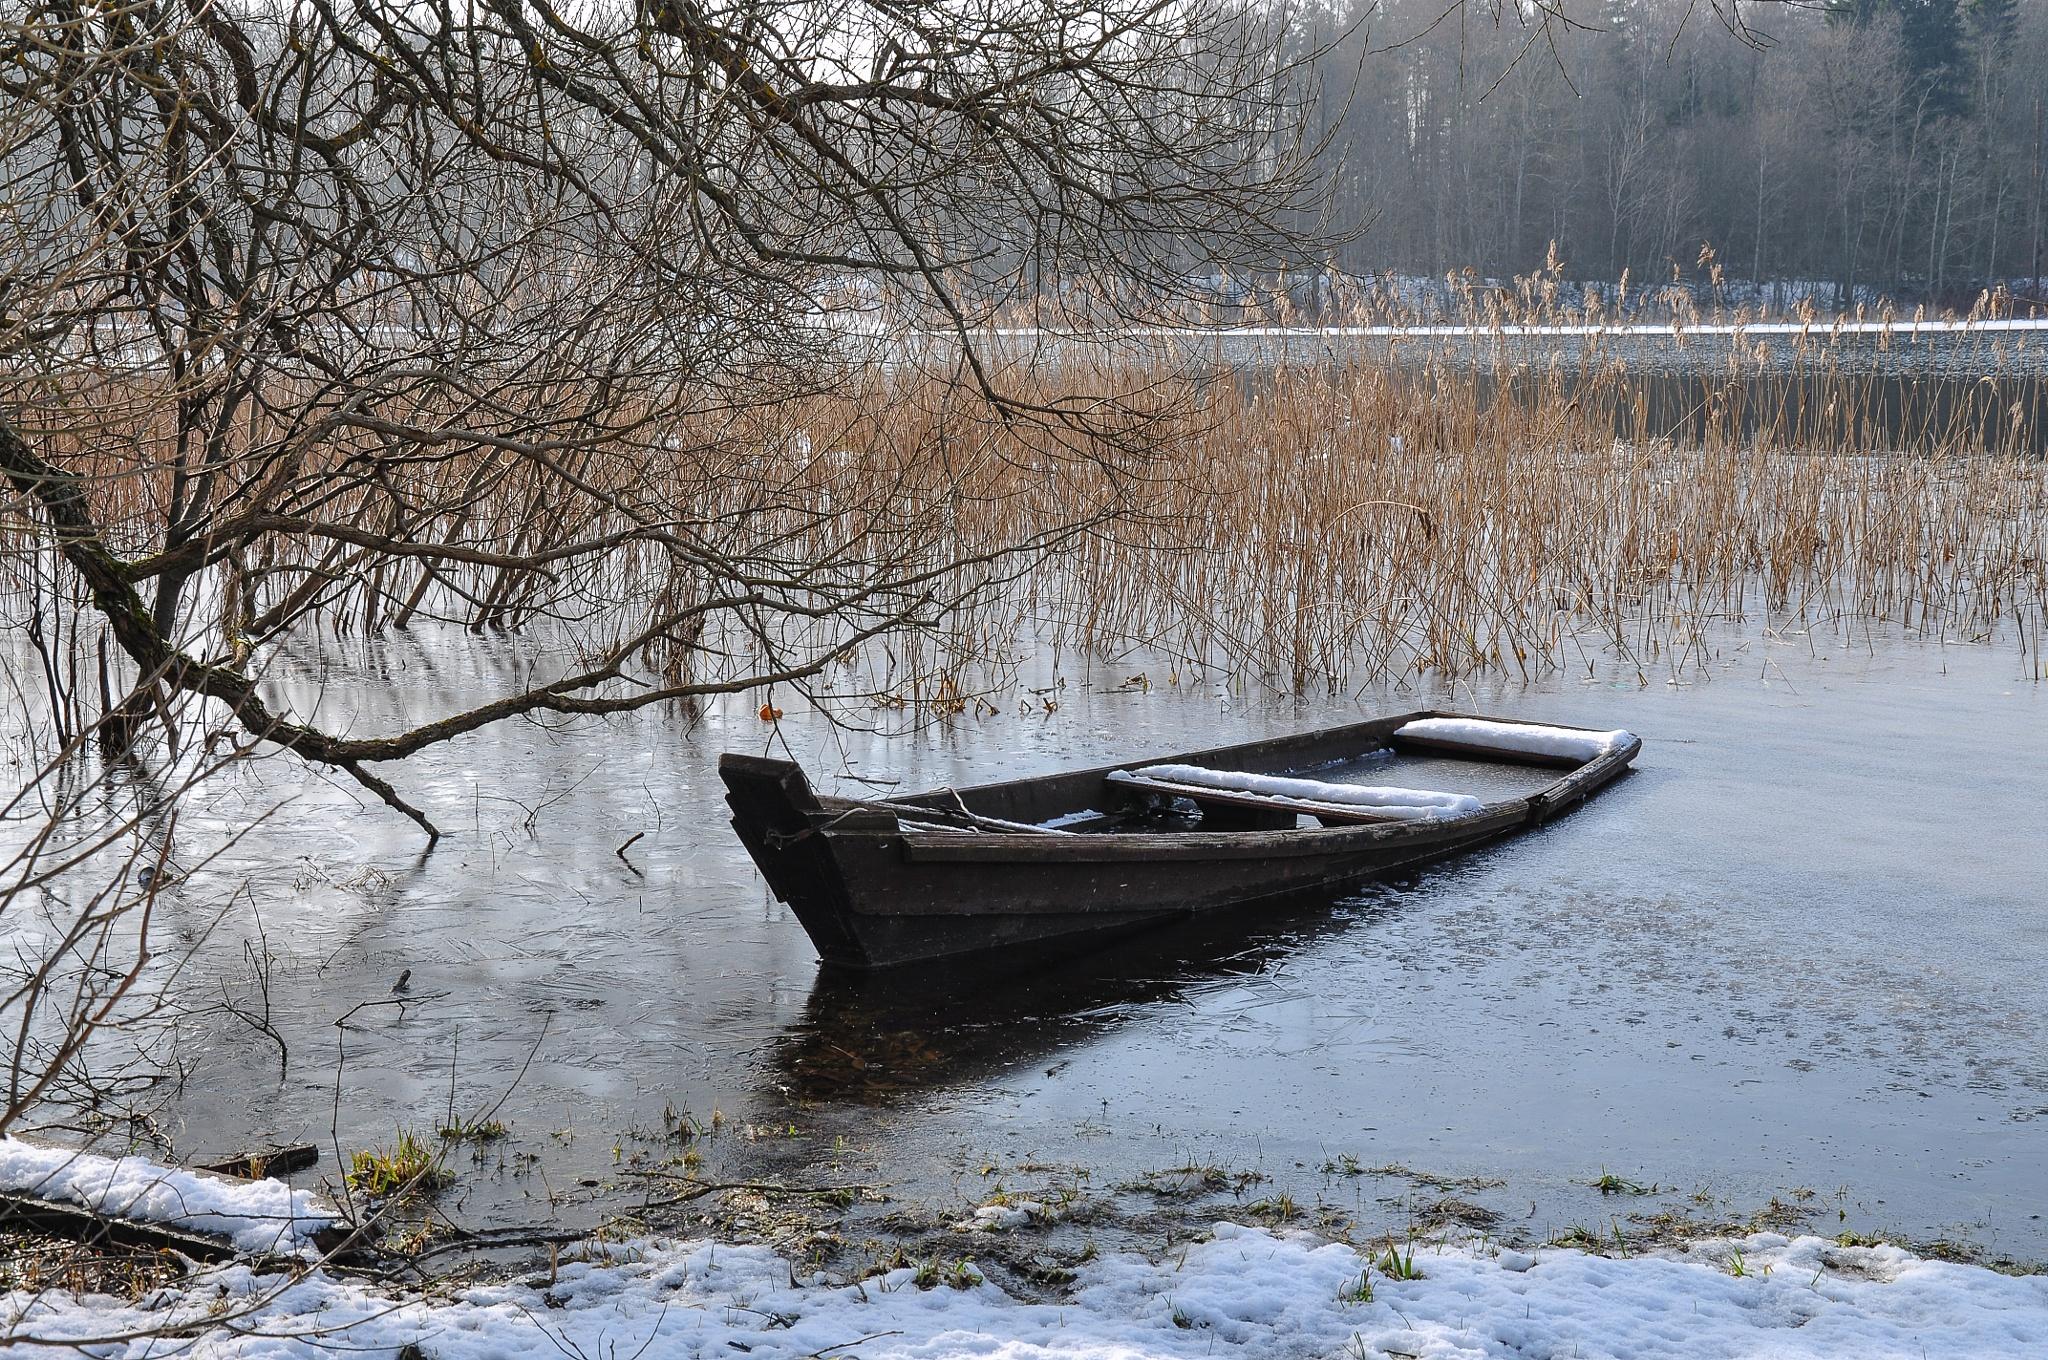 Winter is over by Irena Gedgaudiene